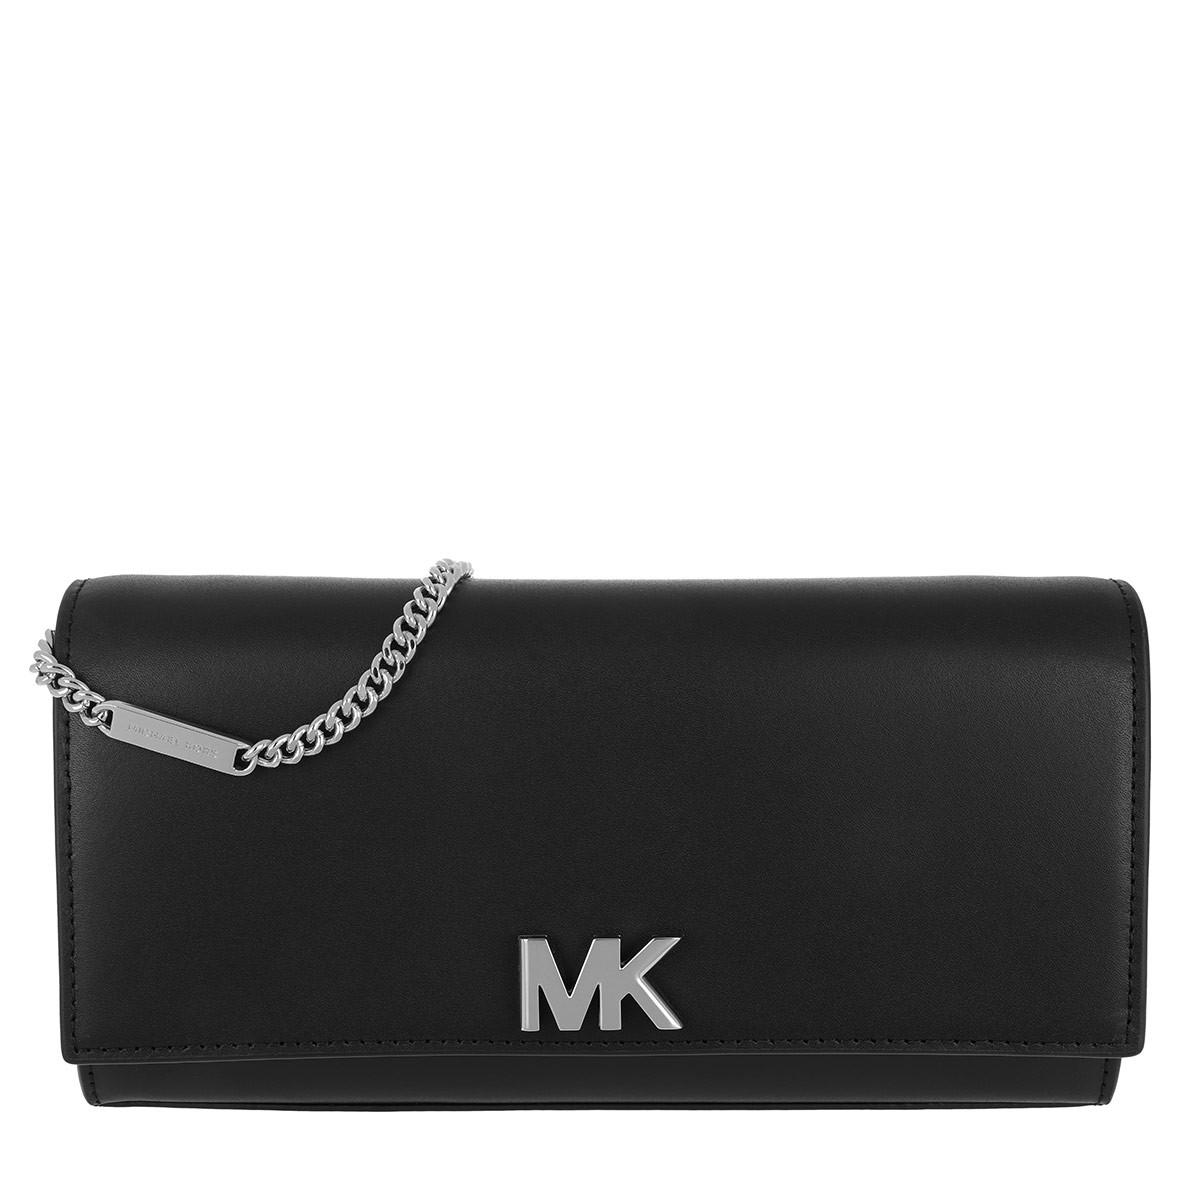 d8d919e39b6 Michael Kors Mott Chain Crossbody Bag Black in Black - Save 20% - Lyst